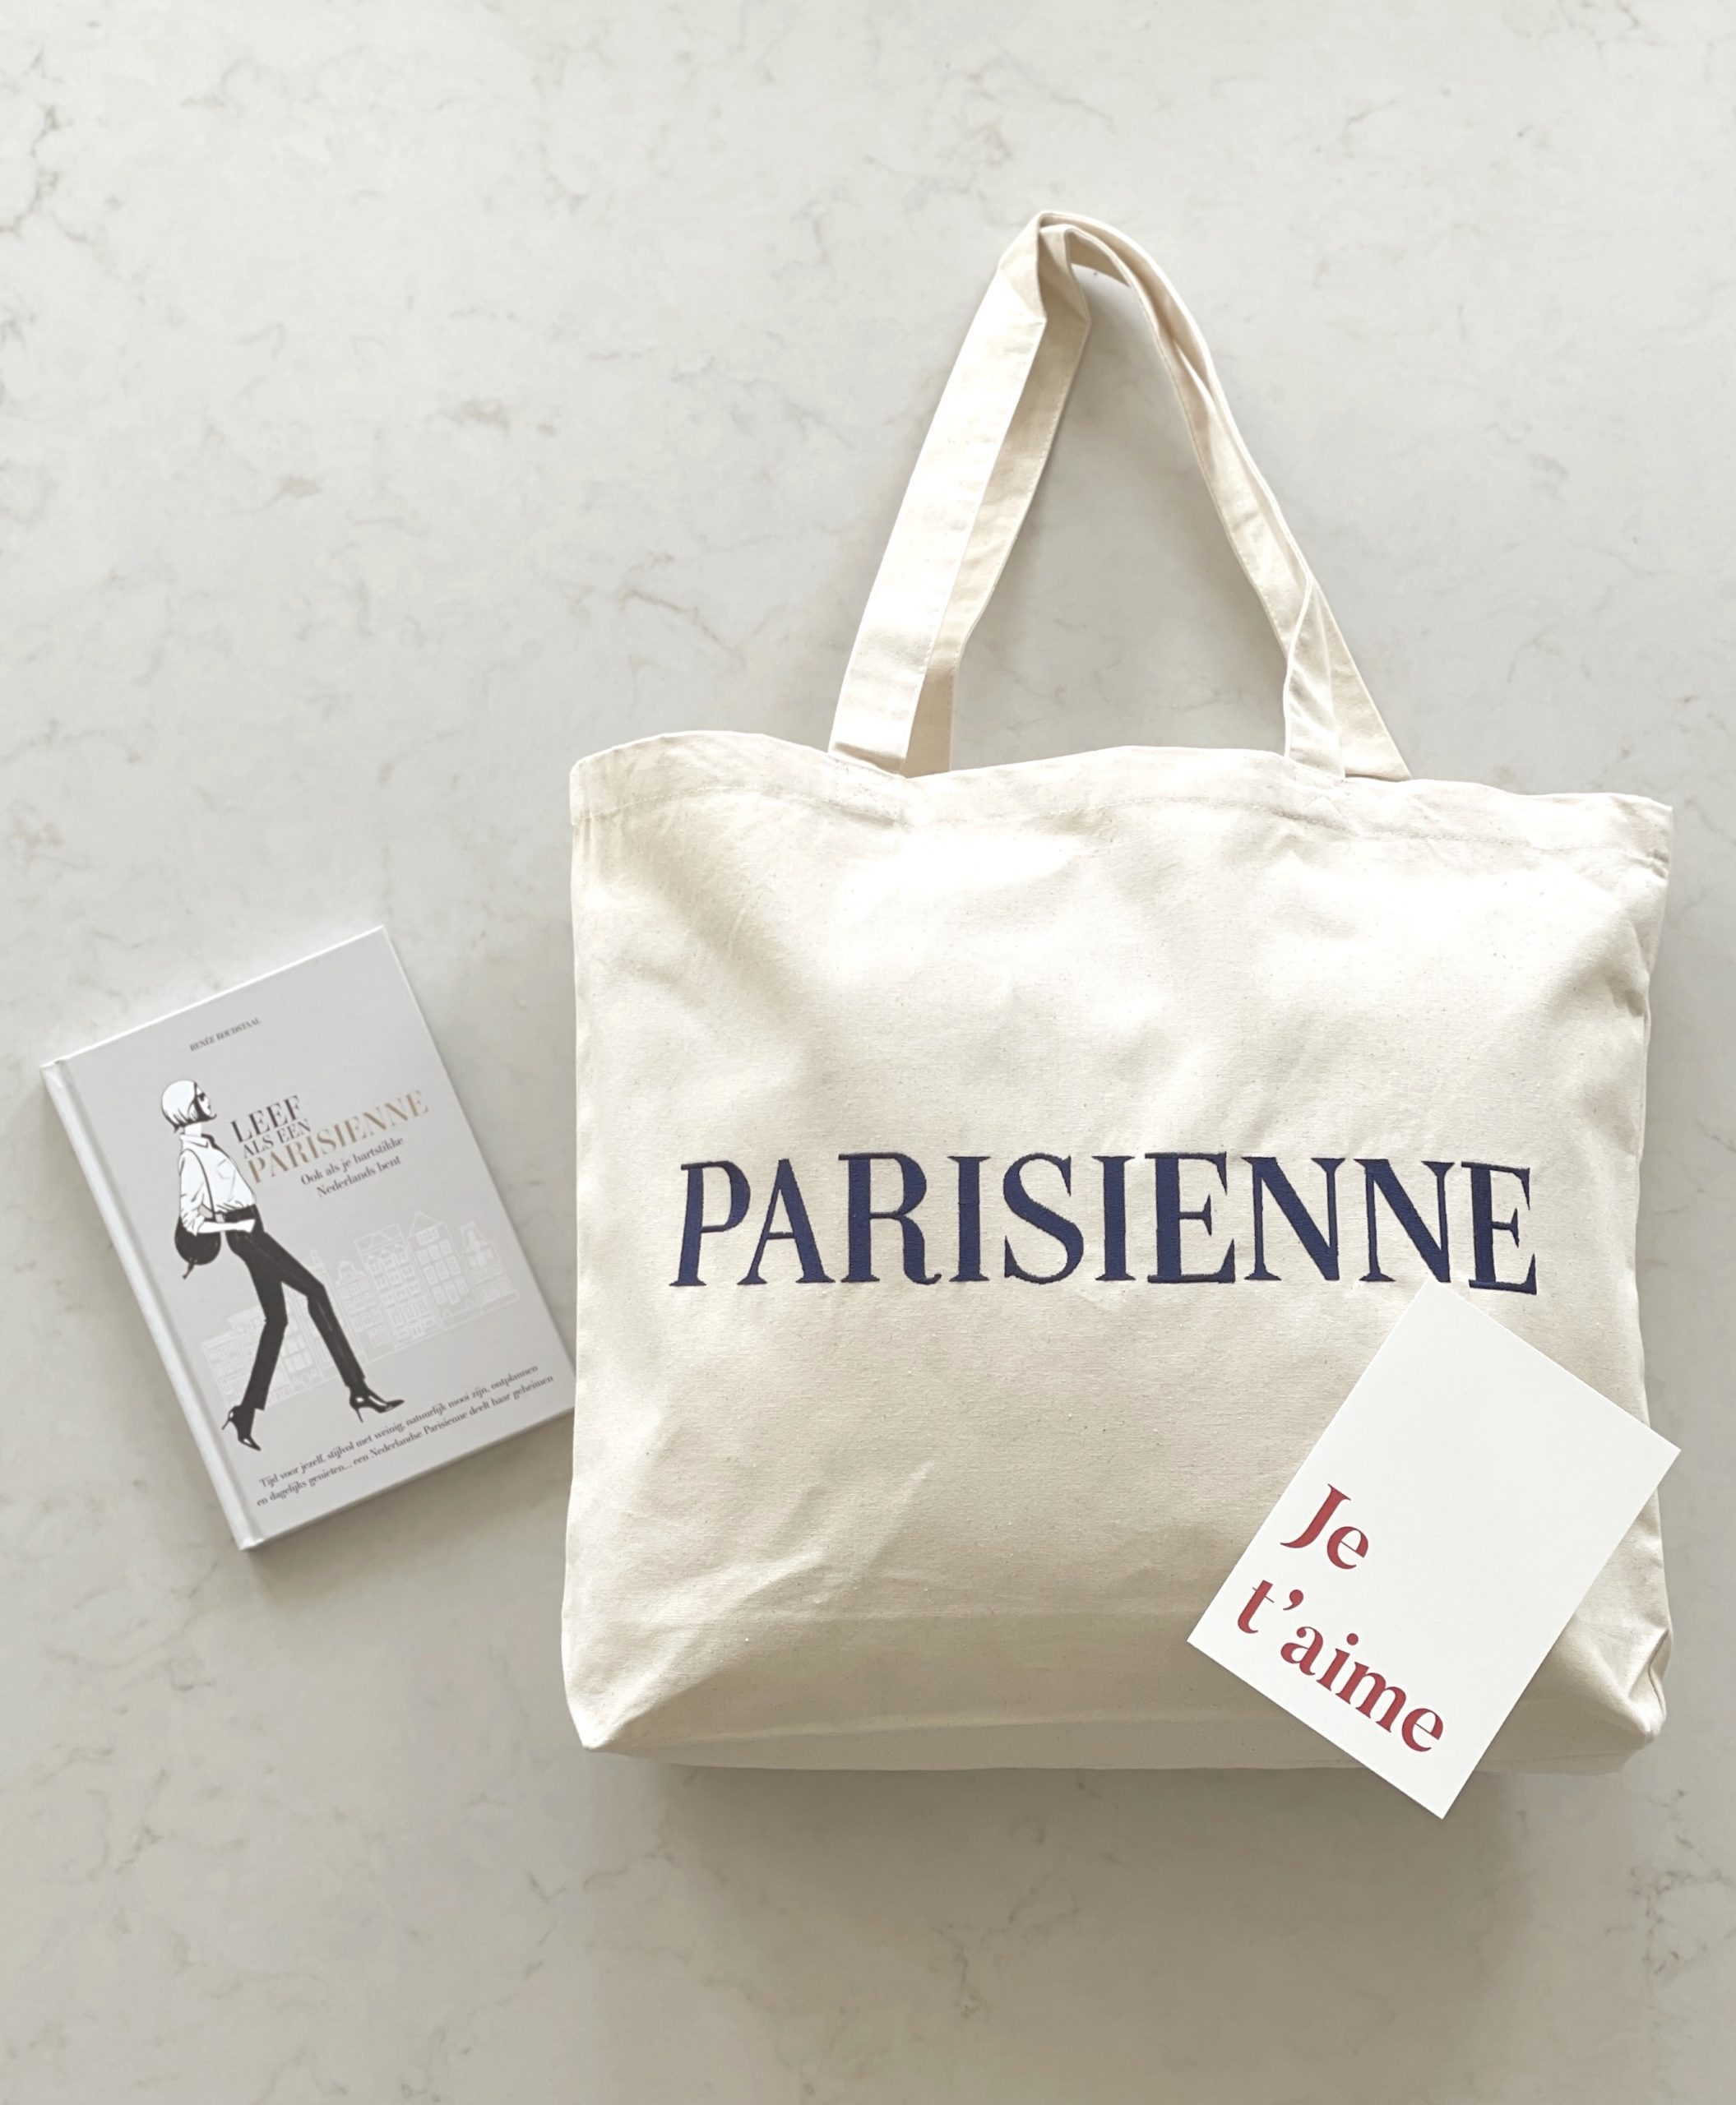 moederdag cadeau parisienne